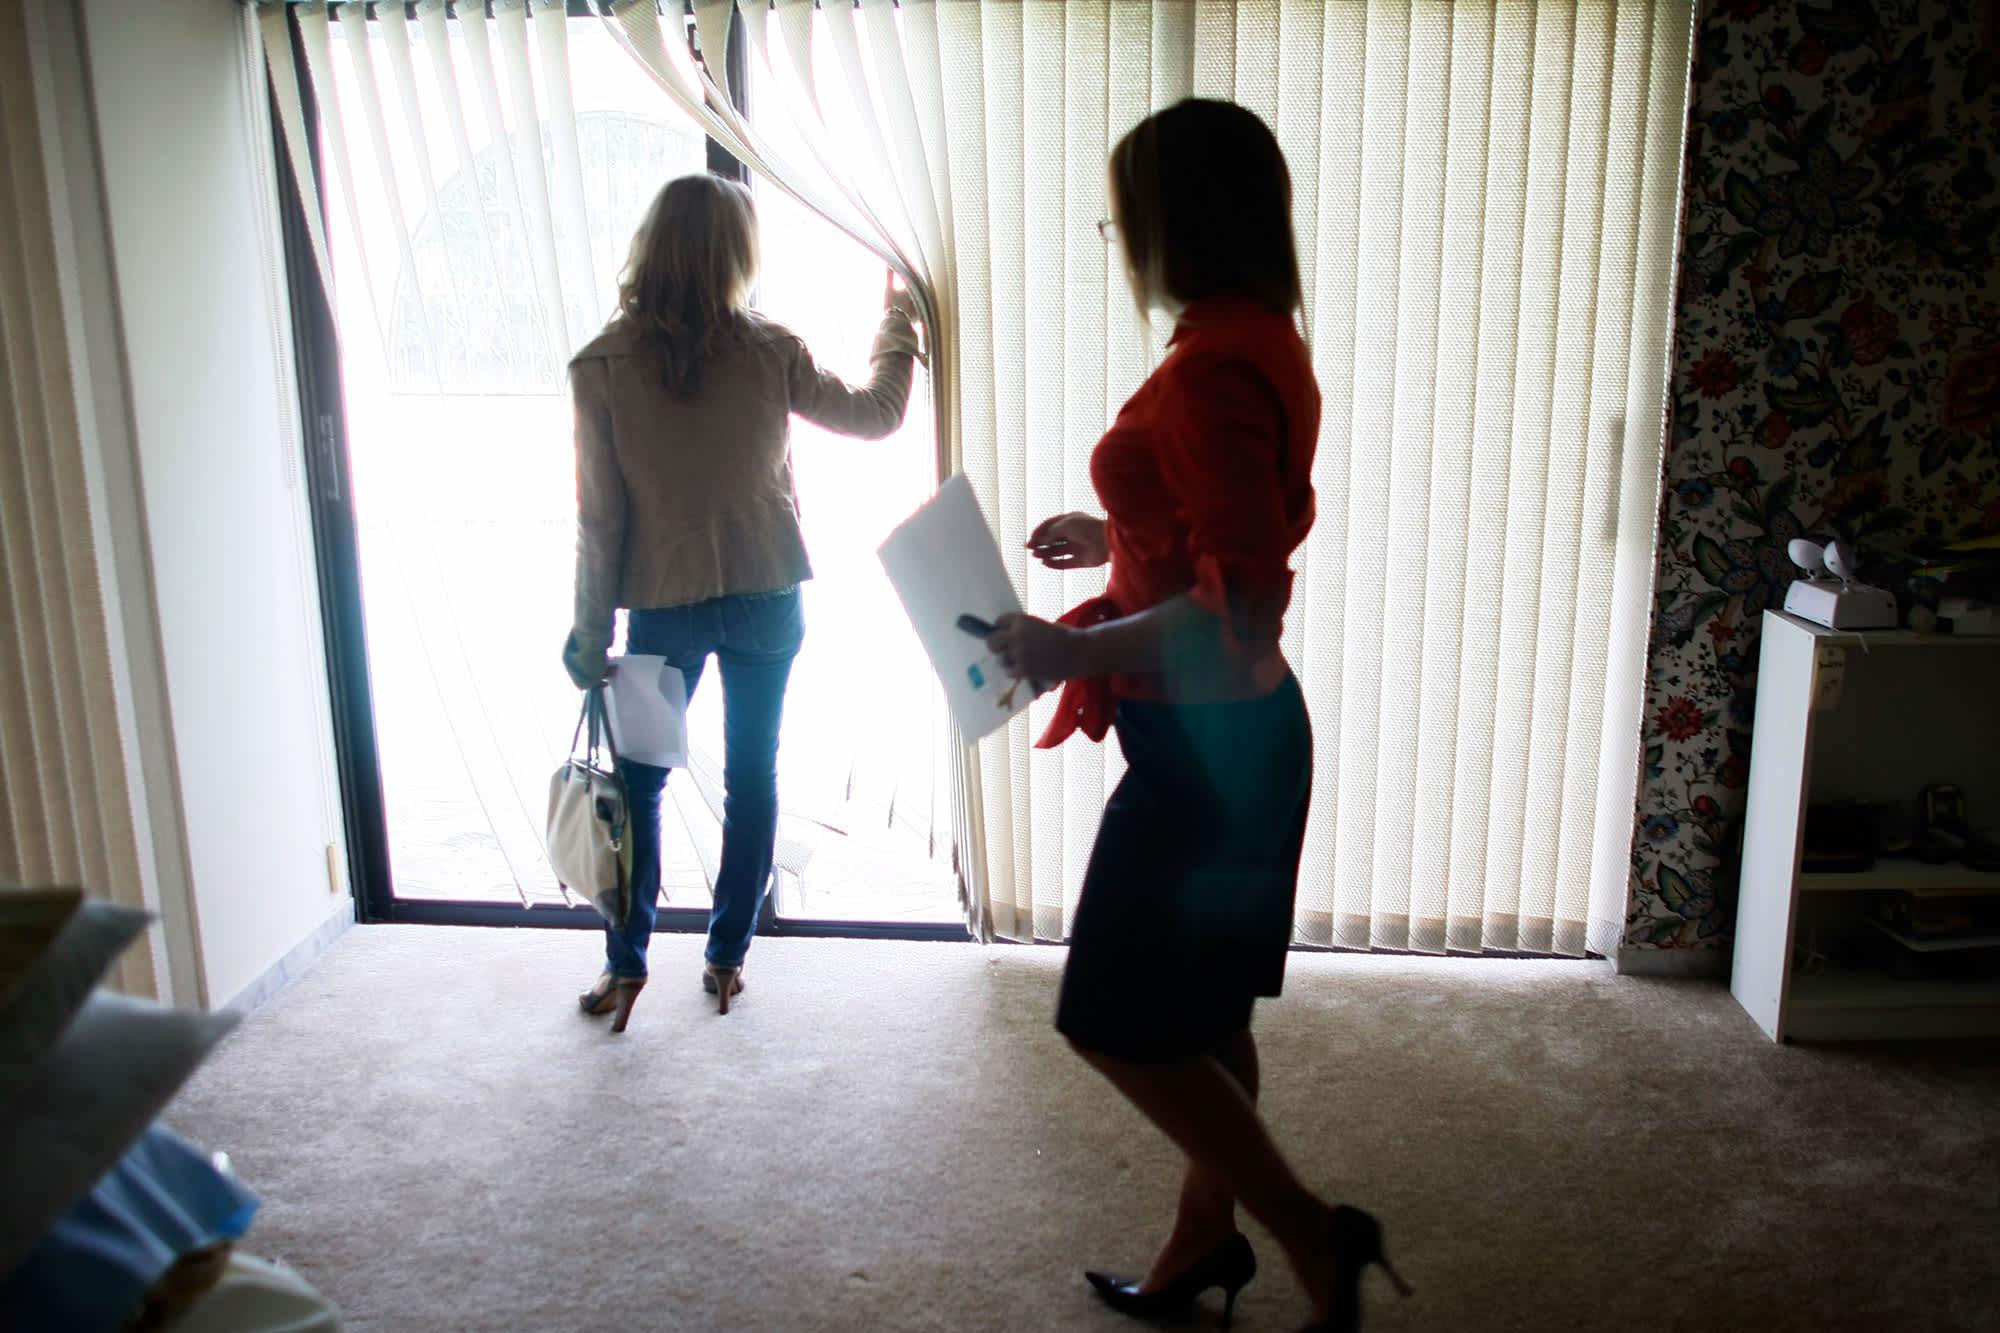 Homebuyers face far fewer bidding wars as the housing market cools off